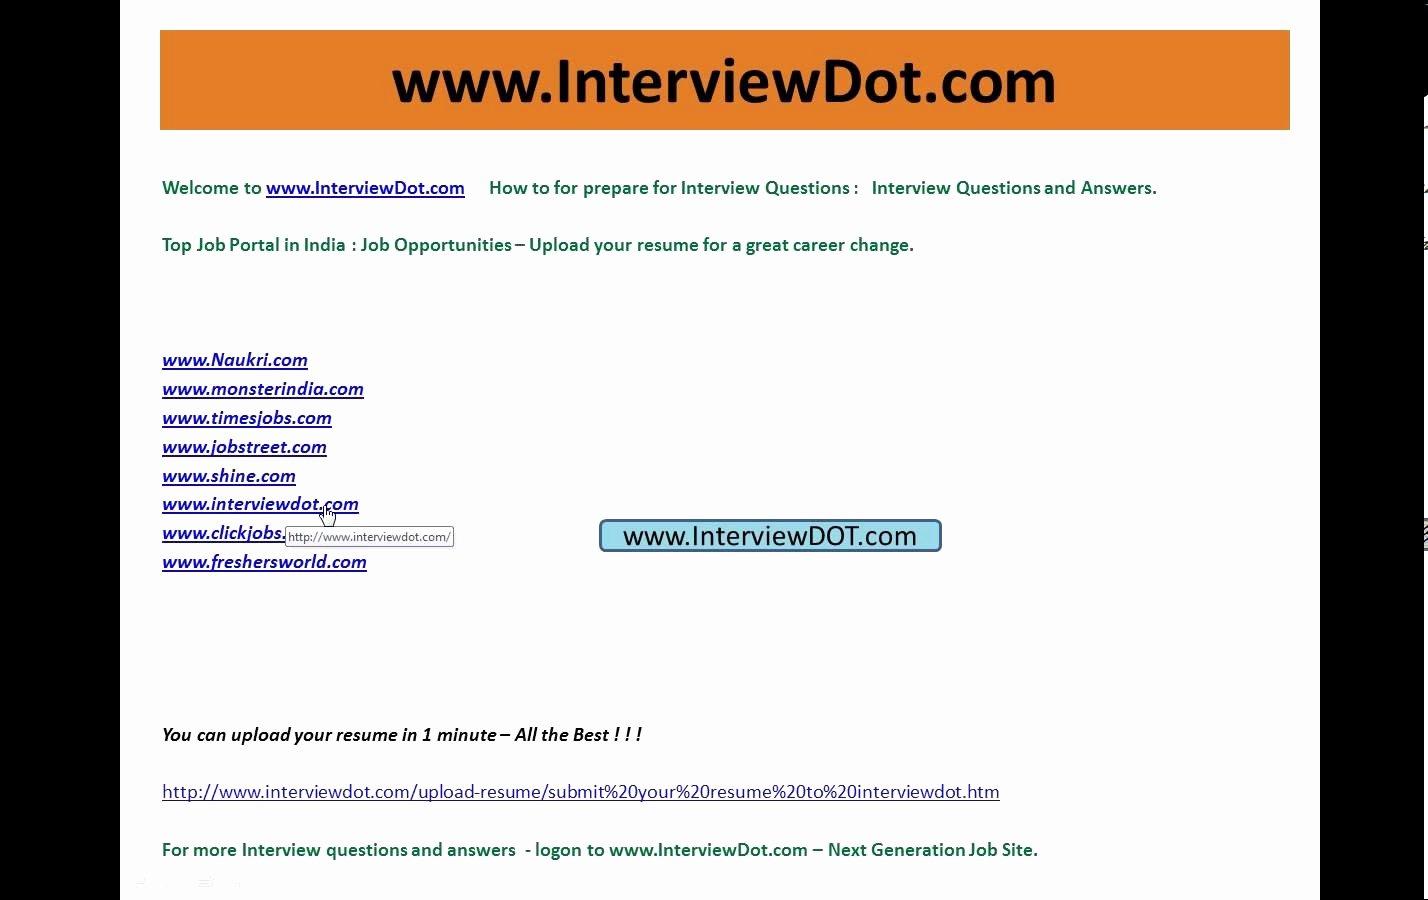 Top Job Sites to Post Resume